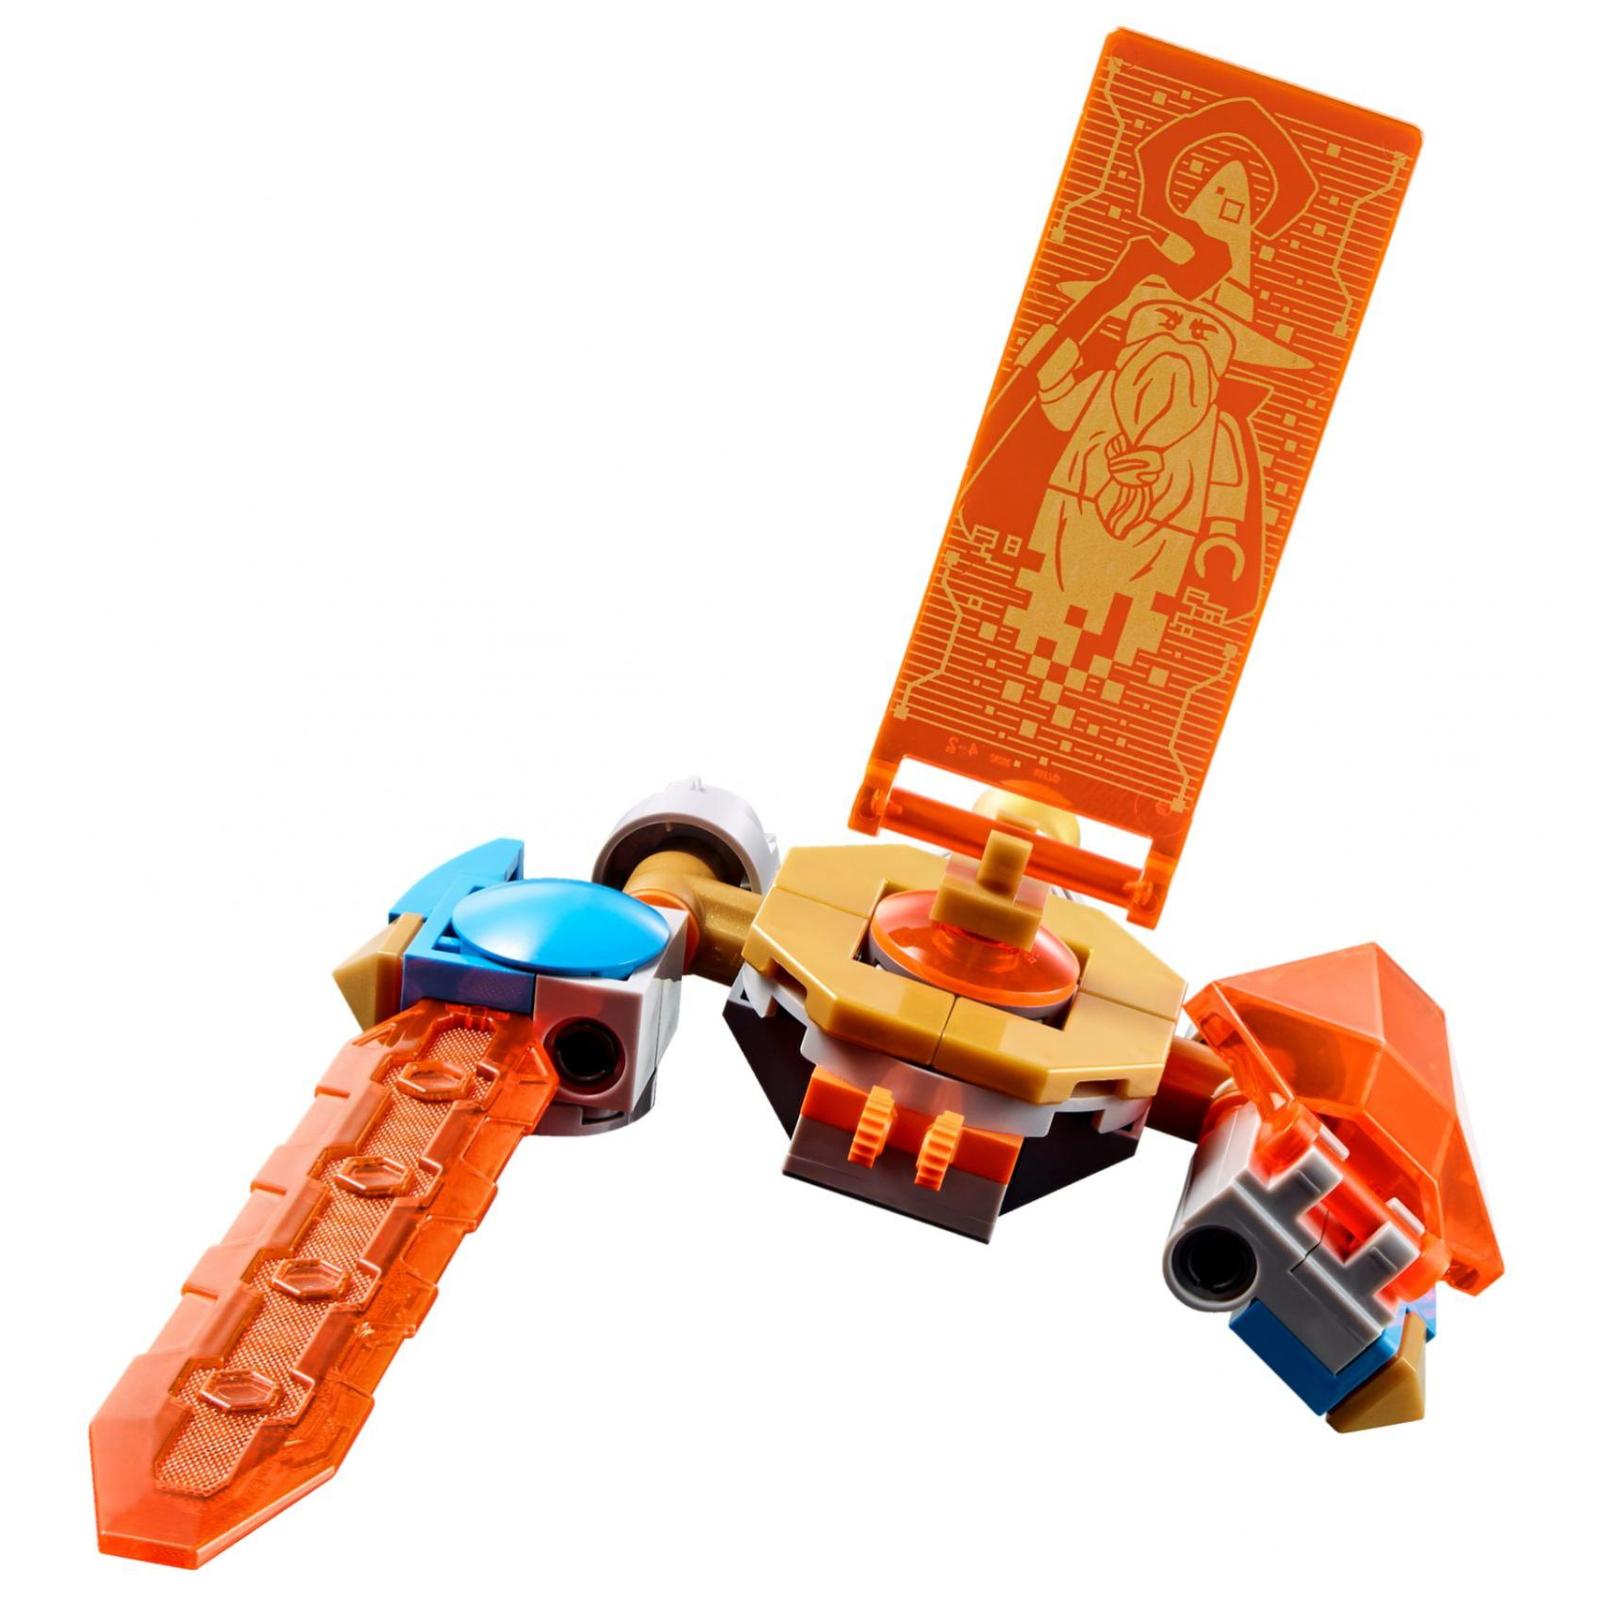 Конструктор LEGO Nexo Knights Бой техномагов (72004) изображение 4